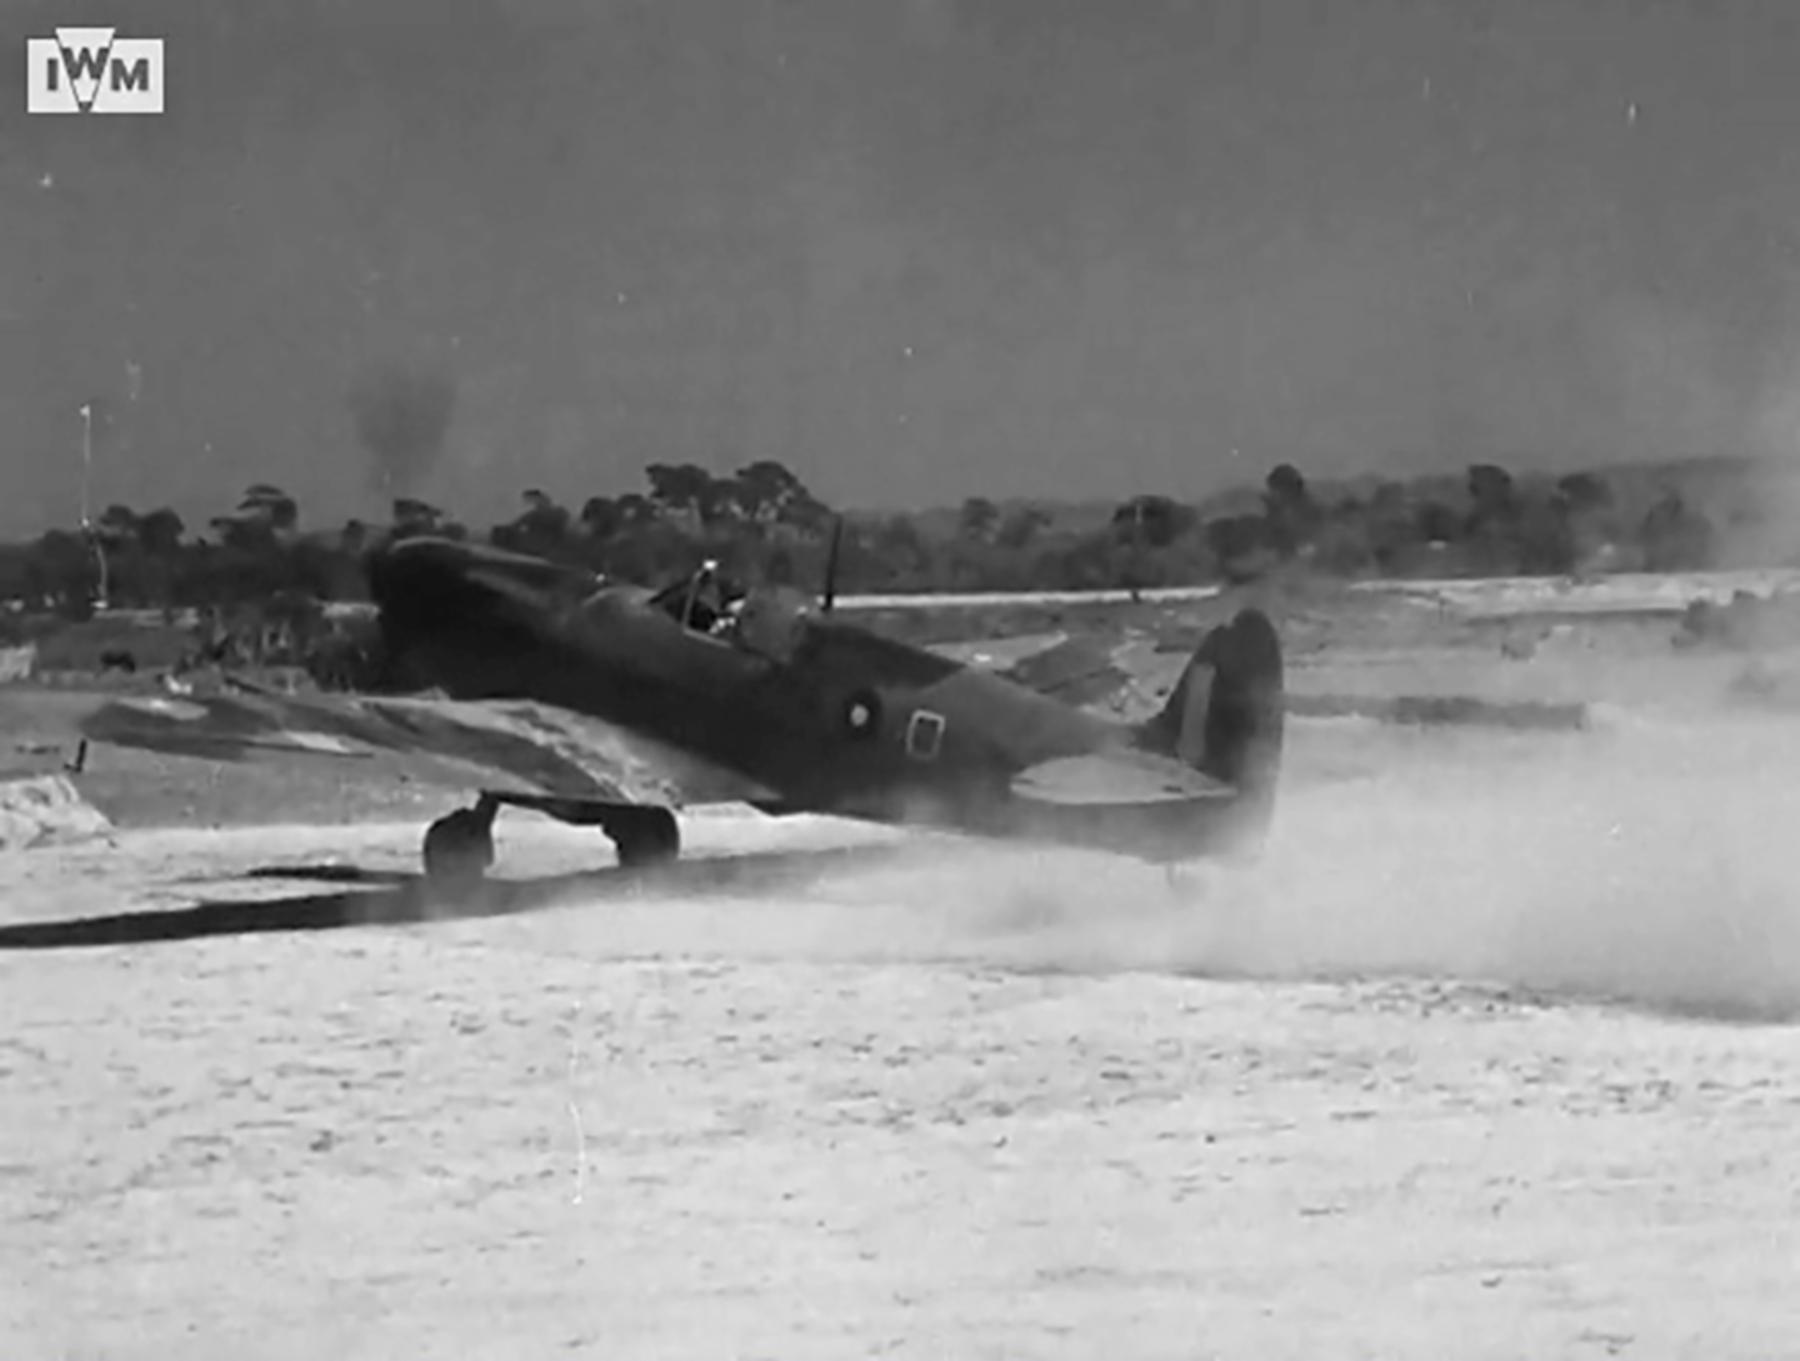 Spitfire VIII RAF 136Sqn HMO taking off from Rumkhapalong operating over Burma CBI 1944 IWM 03